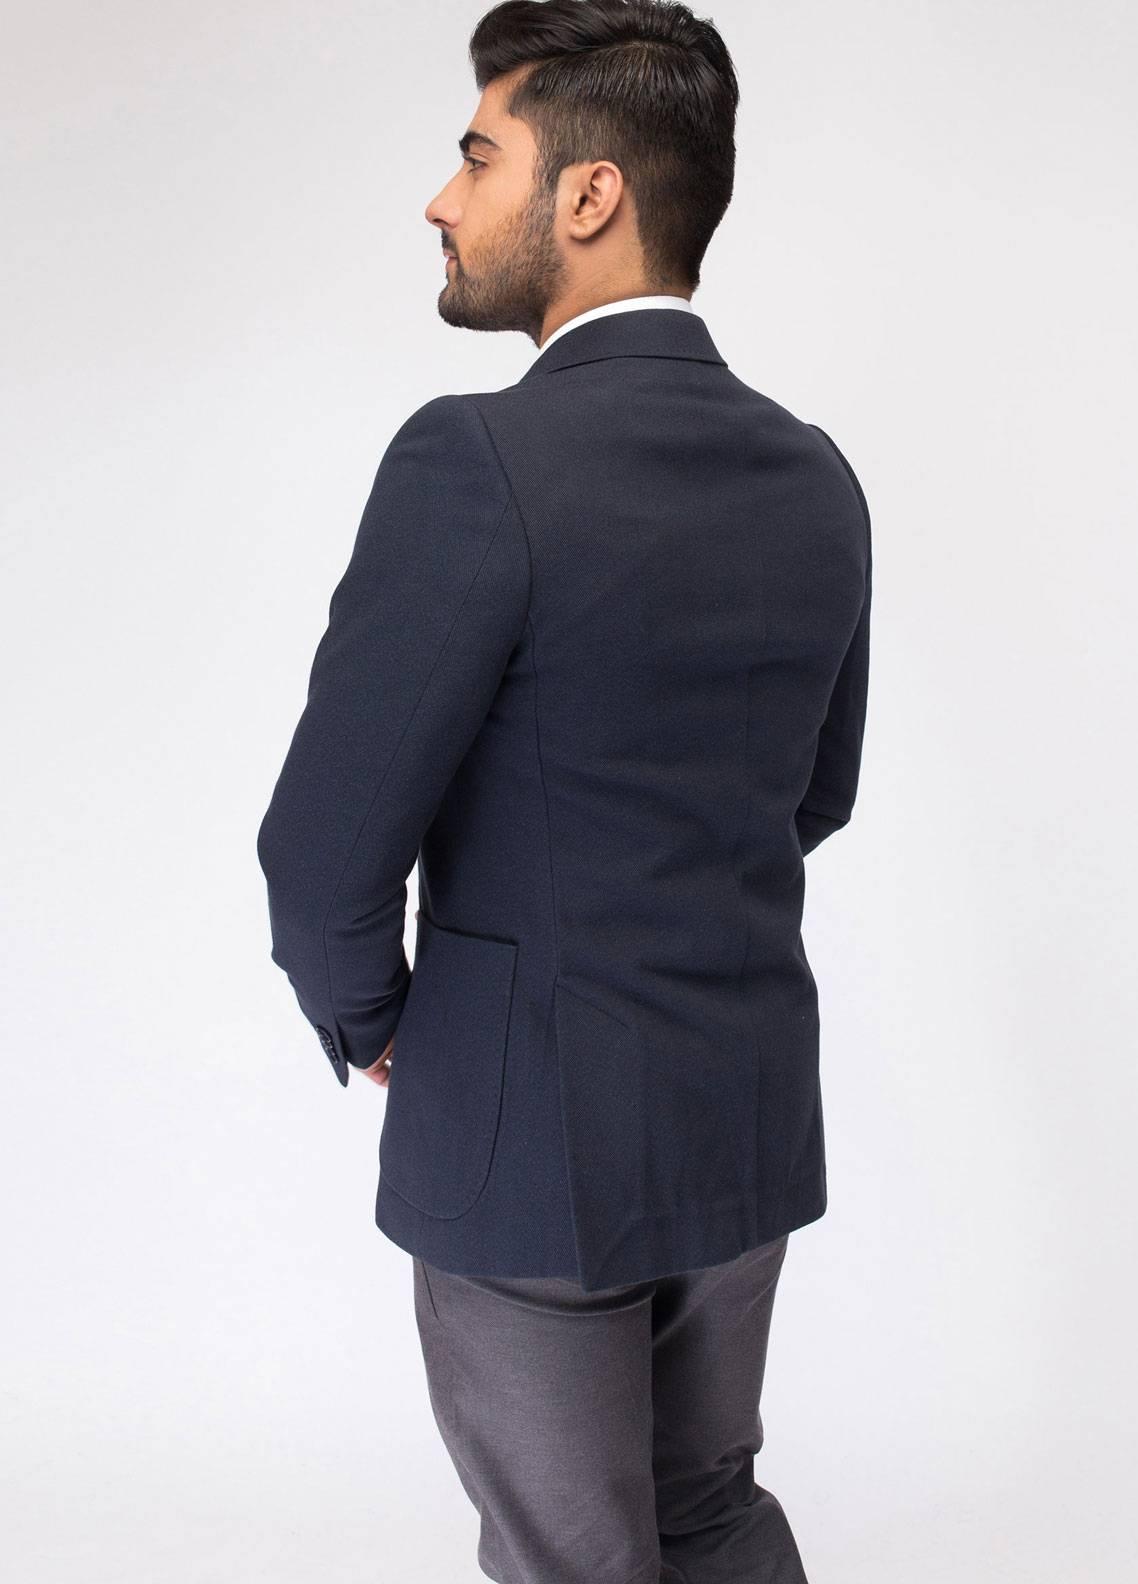 Brumano Cotton Casual Blazer for Men - Navy Blue BLZ-502